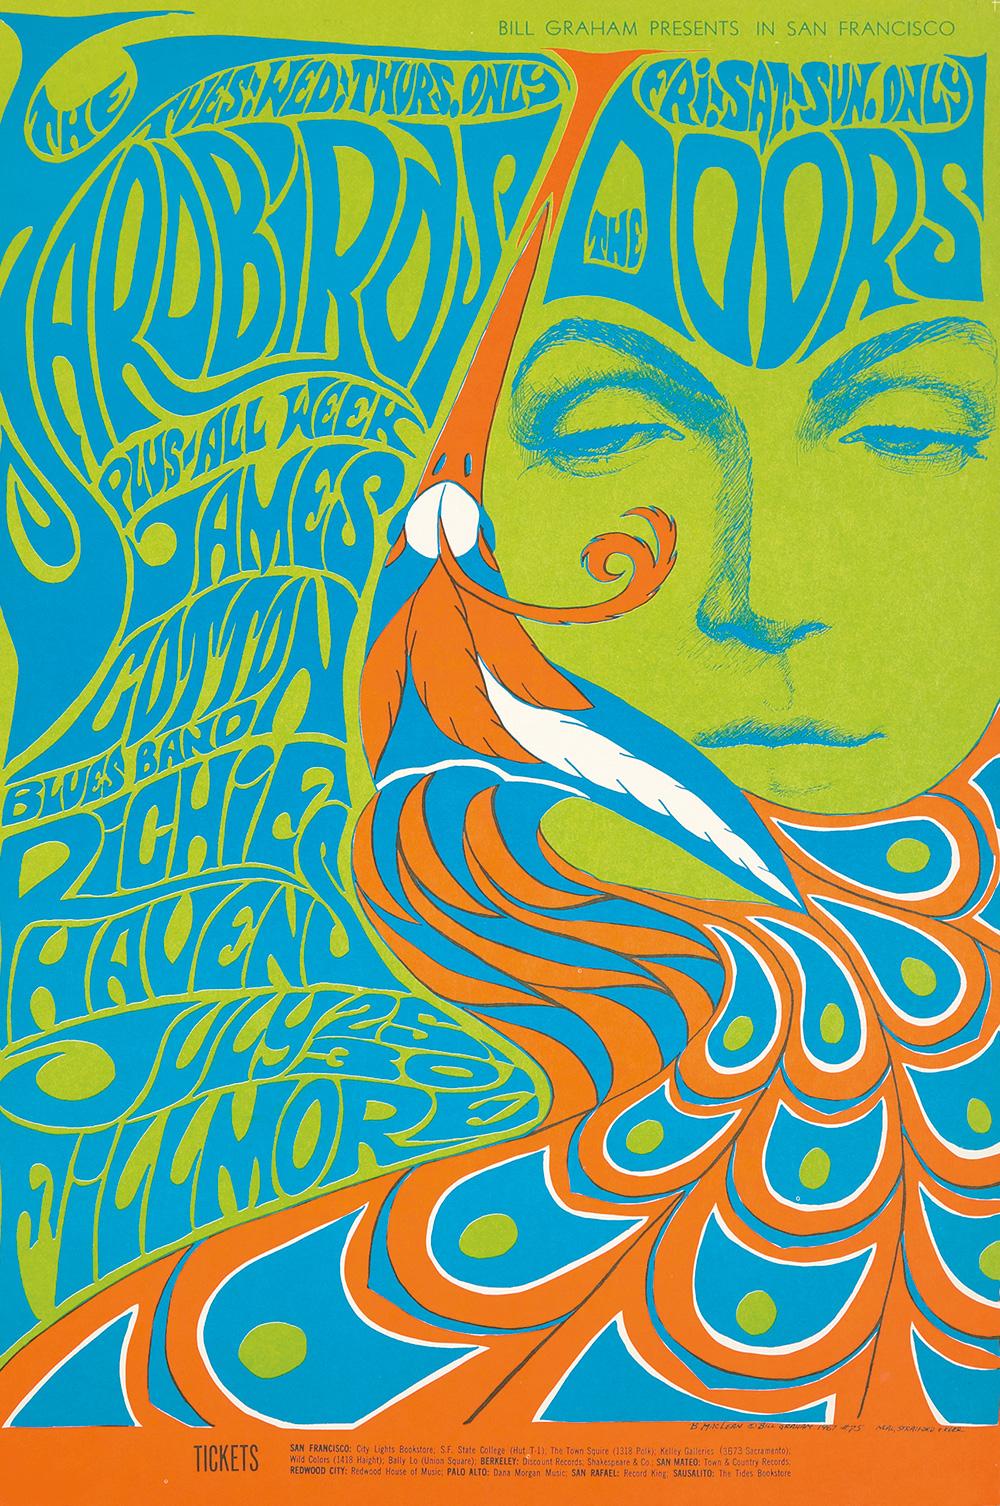 135. The Yardbirds and the Doors. 1967.